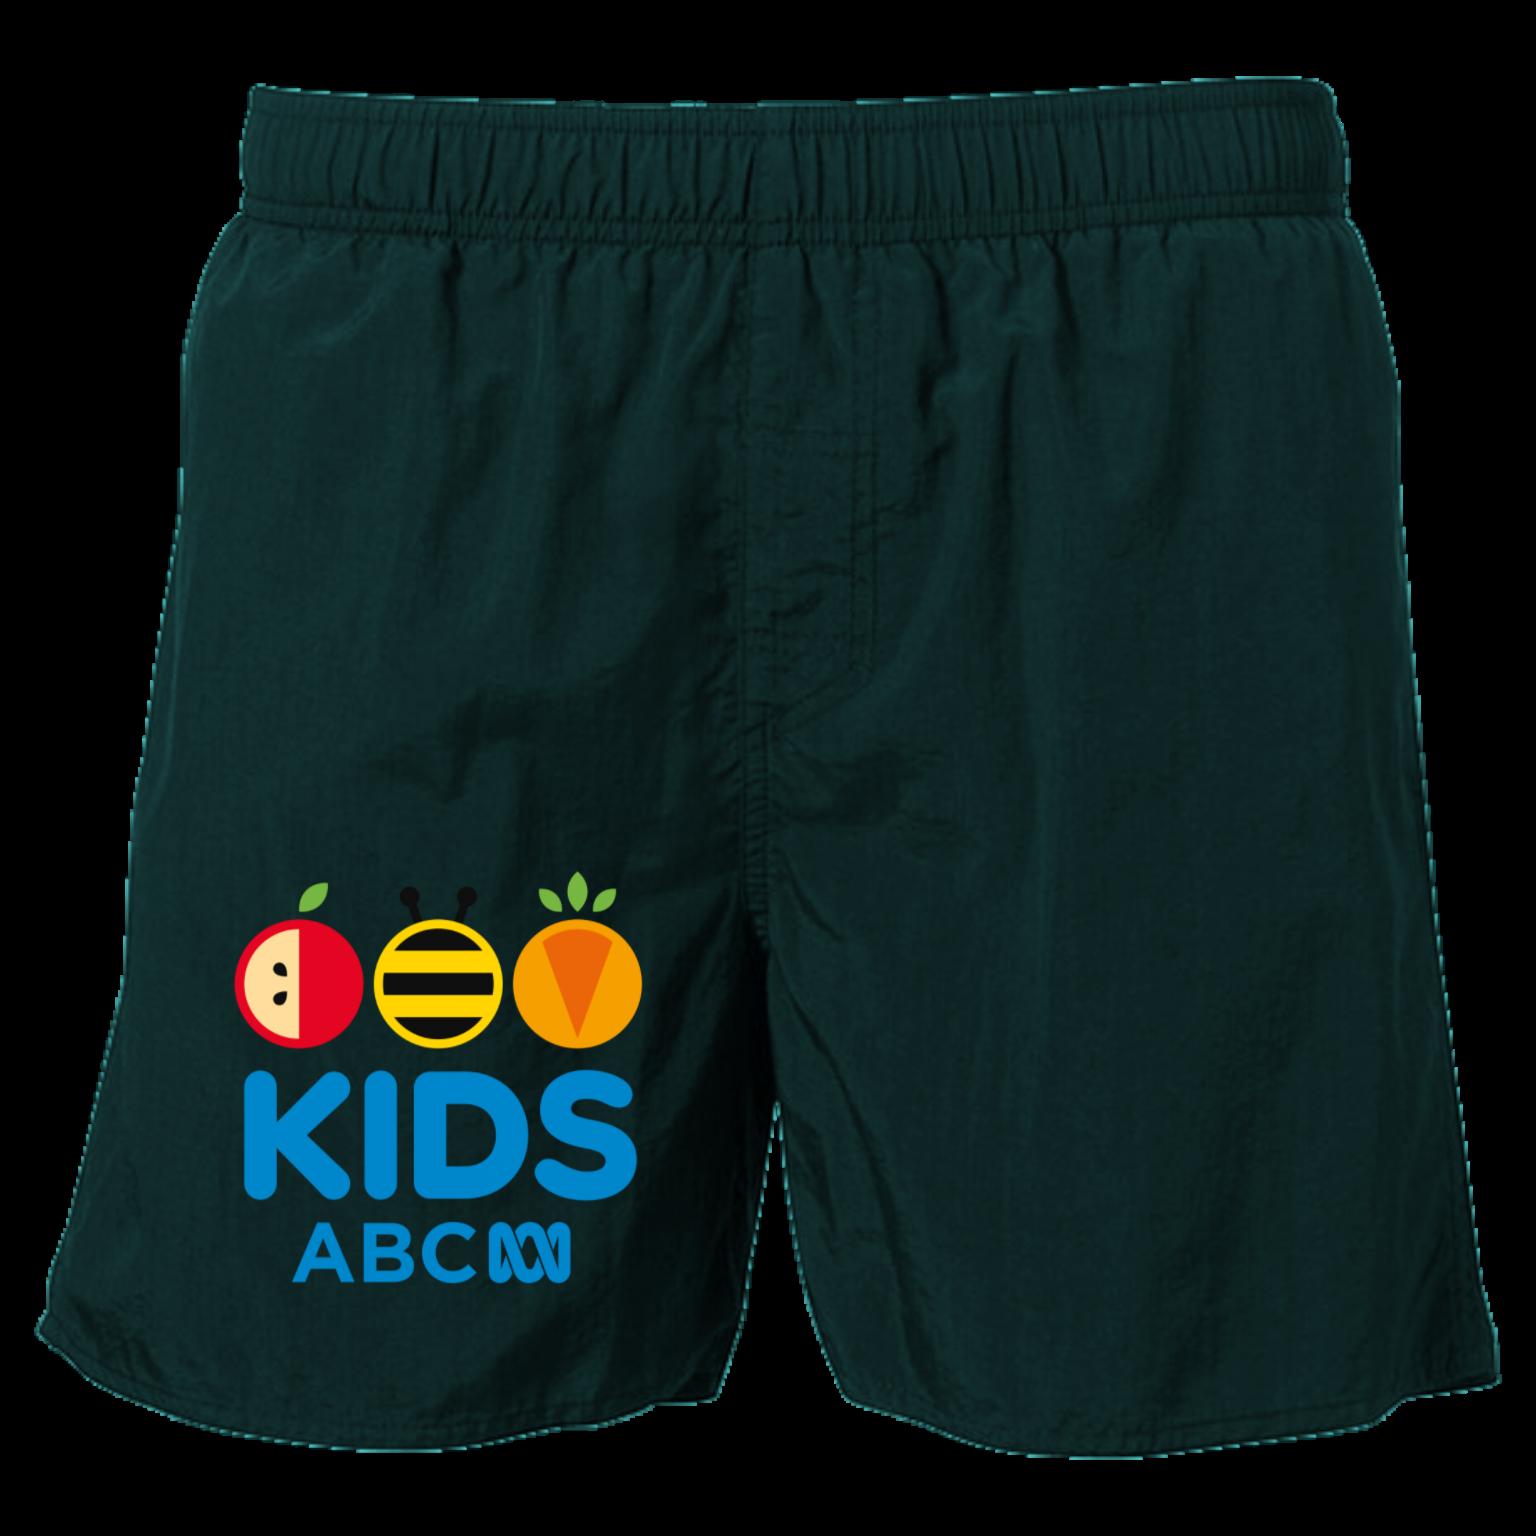 ABC Kids Men's Swim Shorts Size M.png